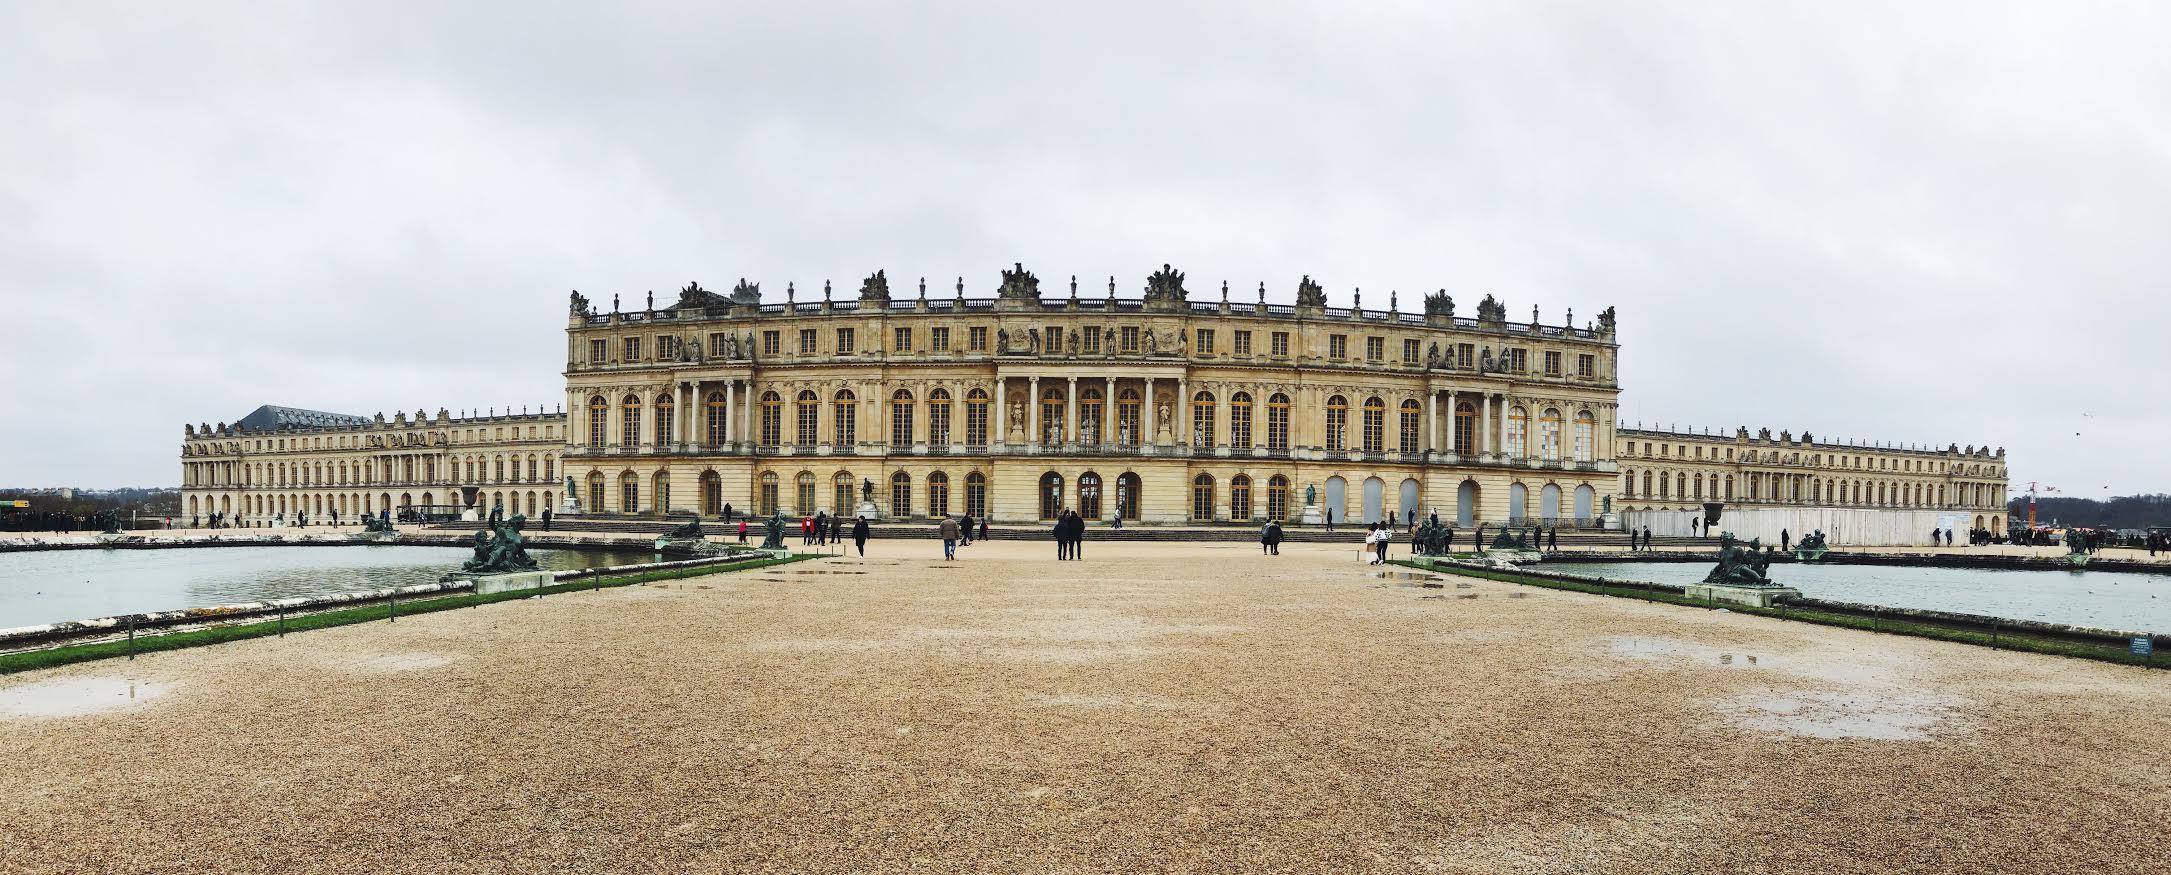 Muslim-travel-guide-Paris-Palace-of-Versailles-exterior.jpg